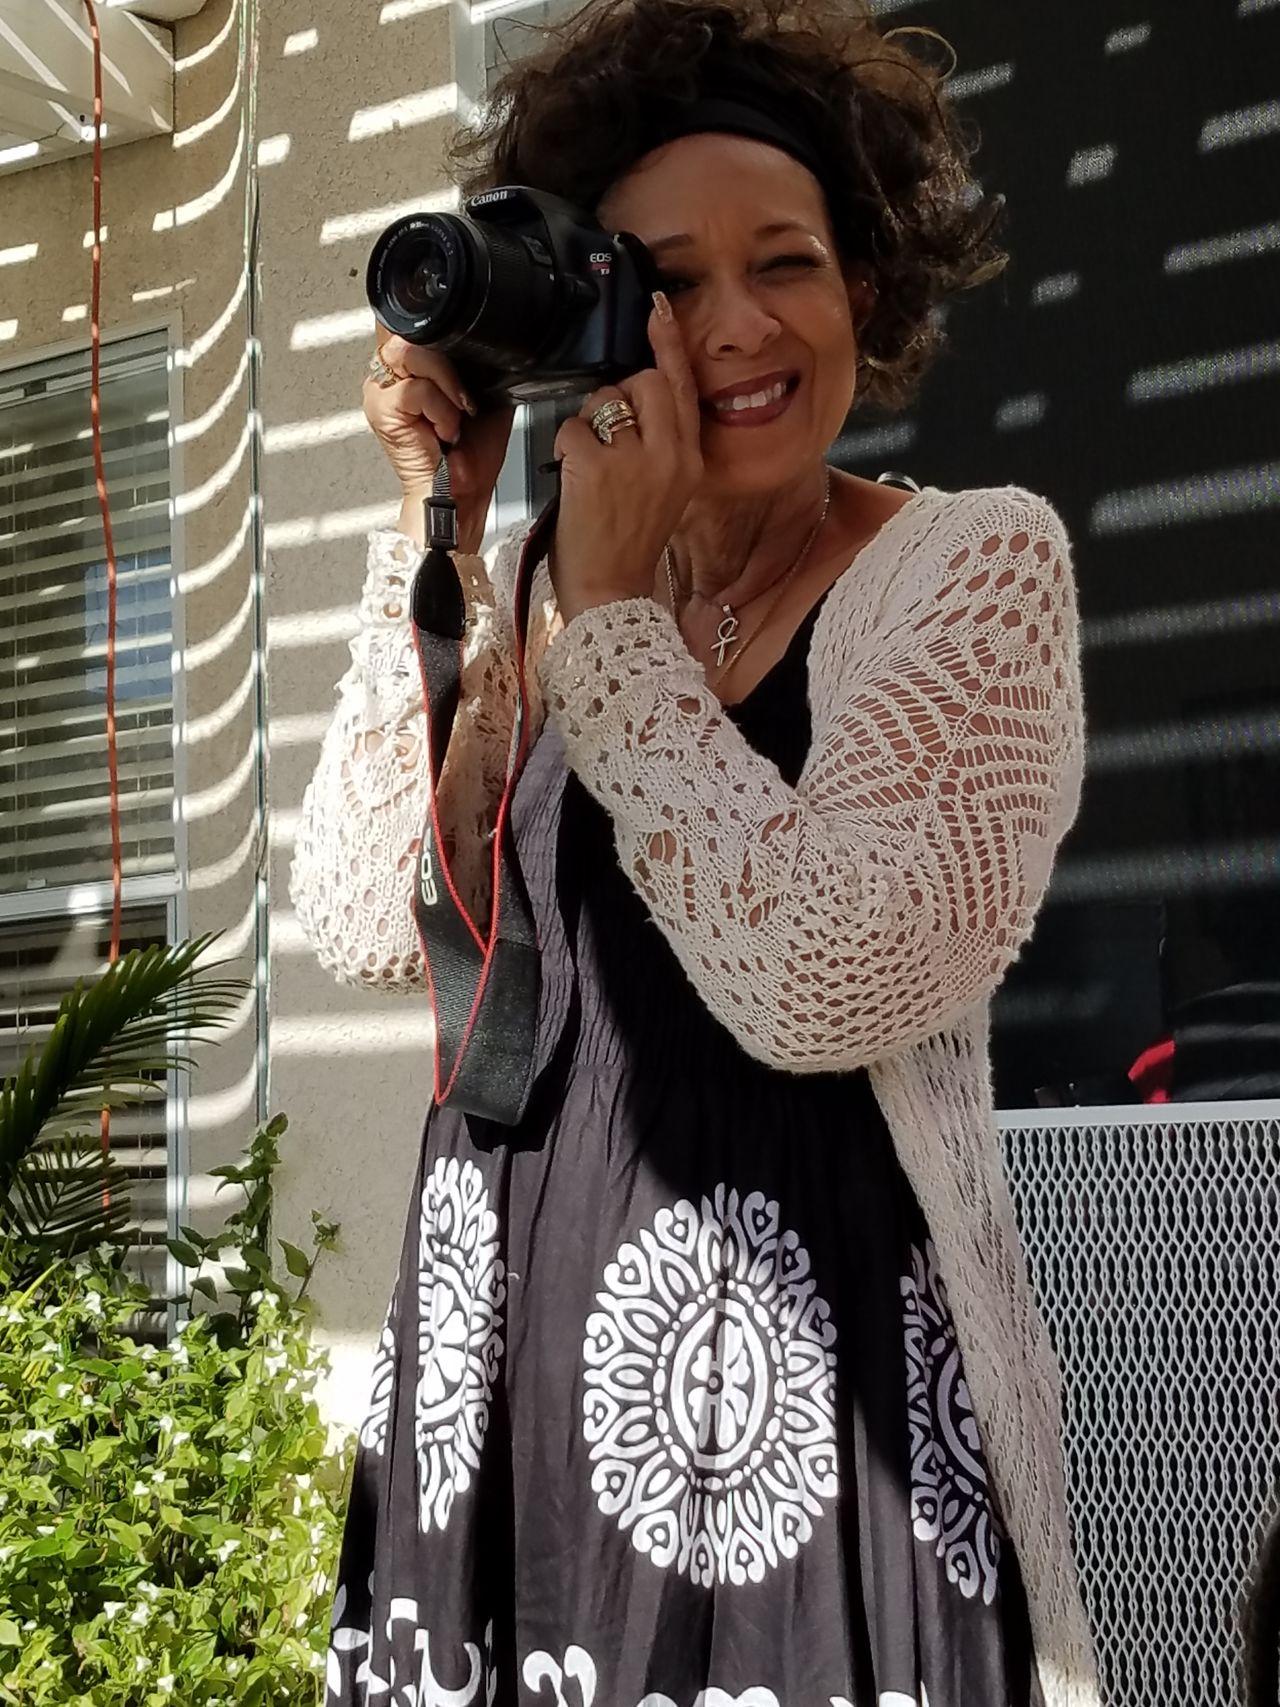 Photo Opt The Portraitist - 2017 EyeEm Awards